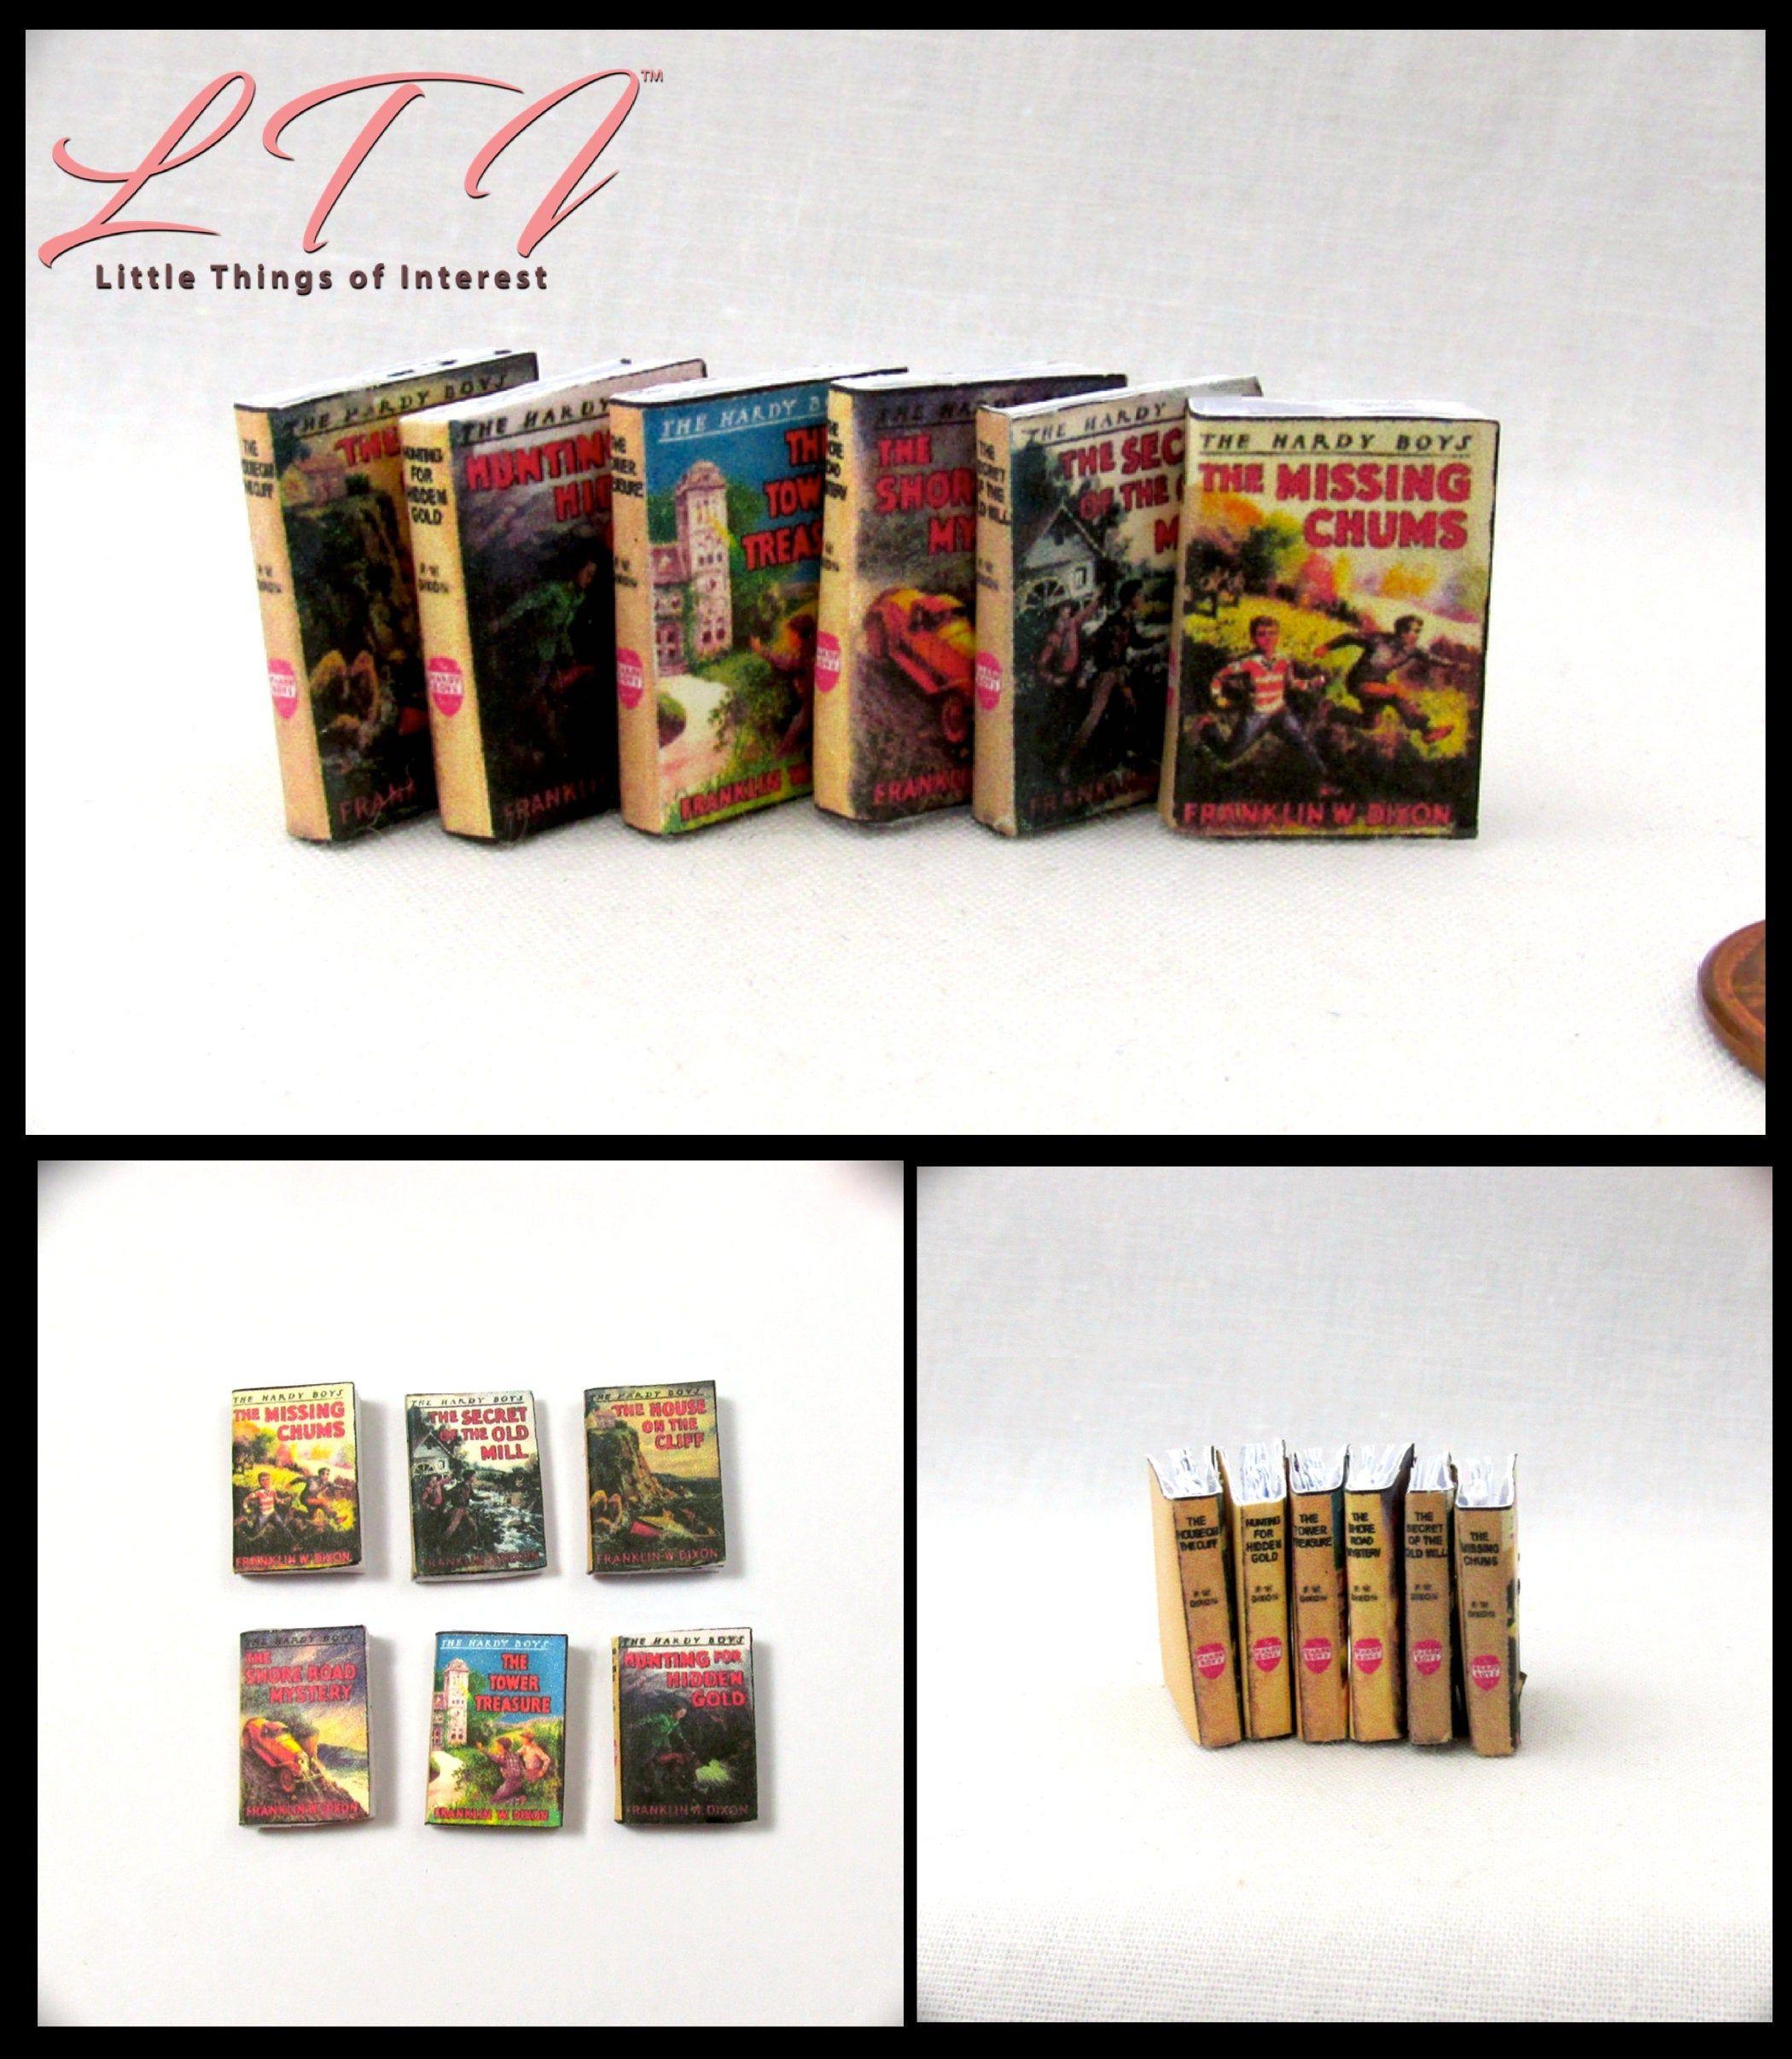 6 the hardy boys books set miniature books dollhouse 112